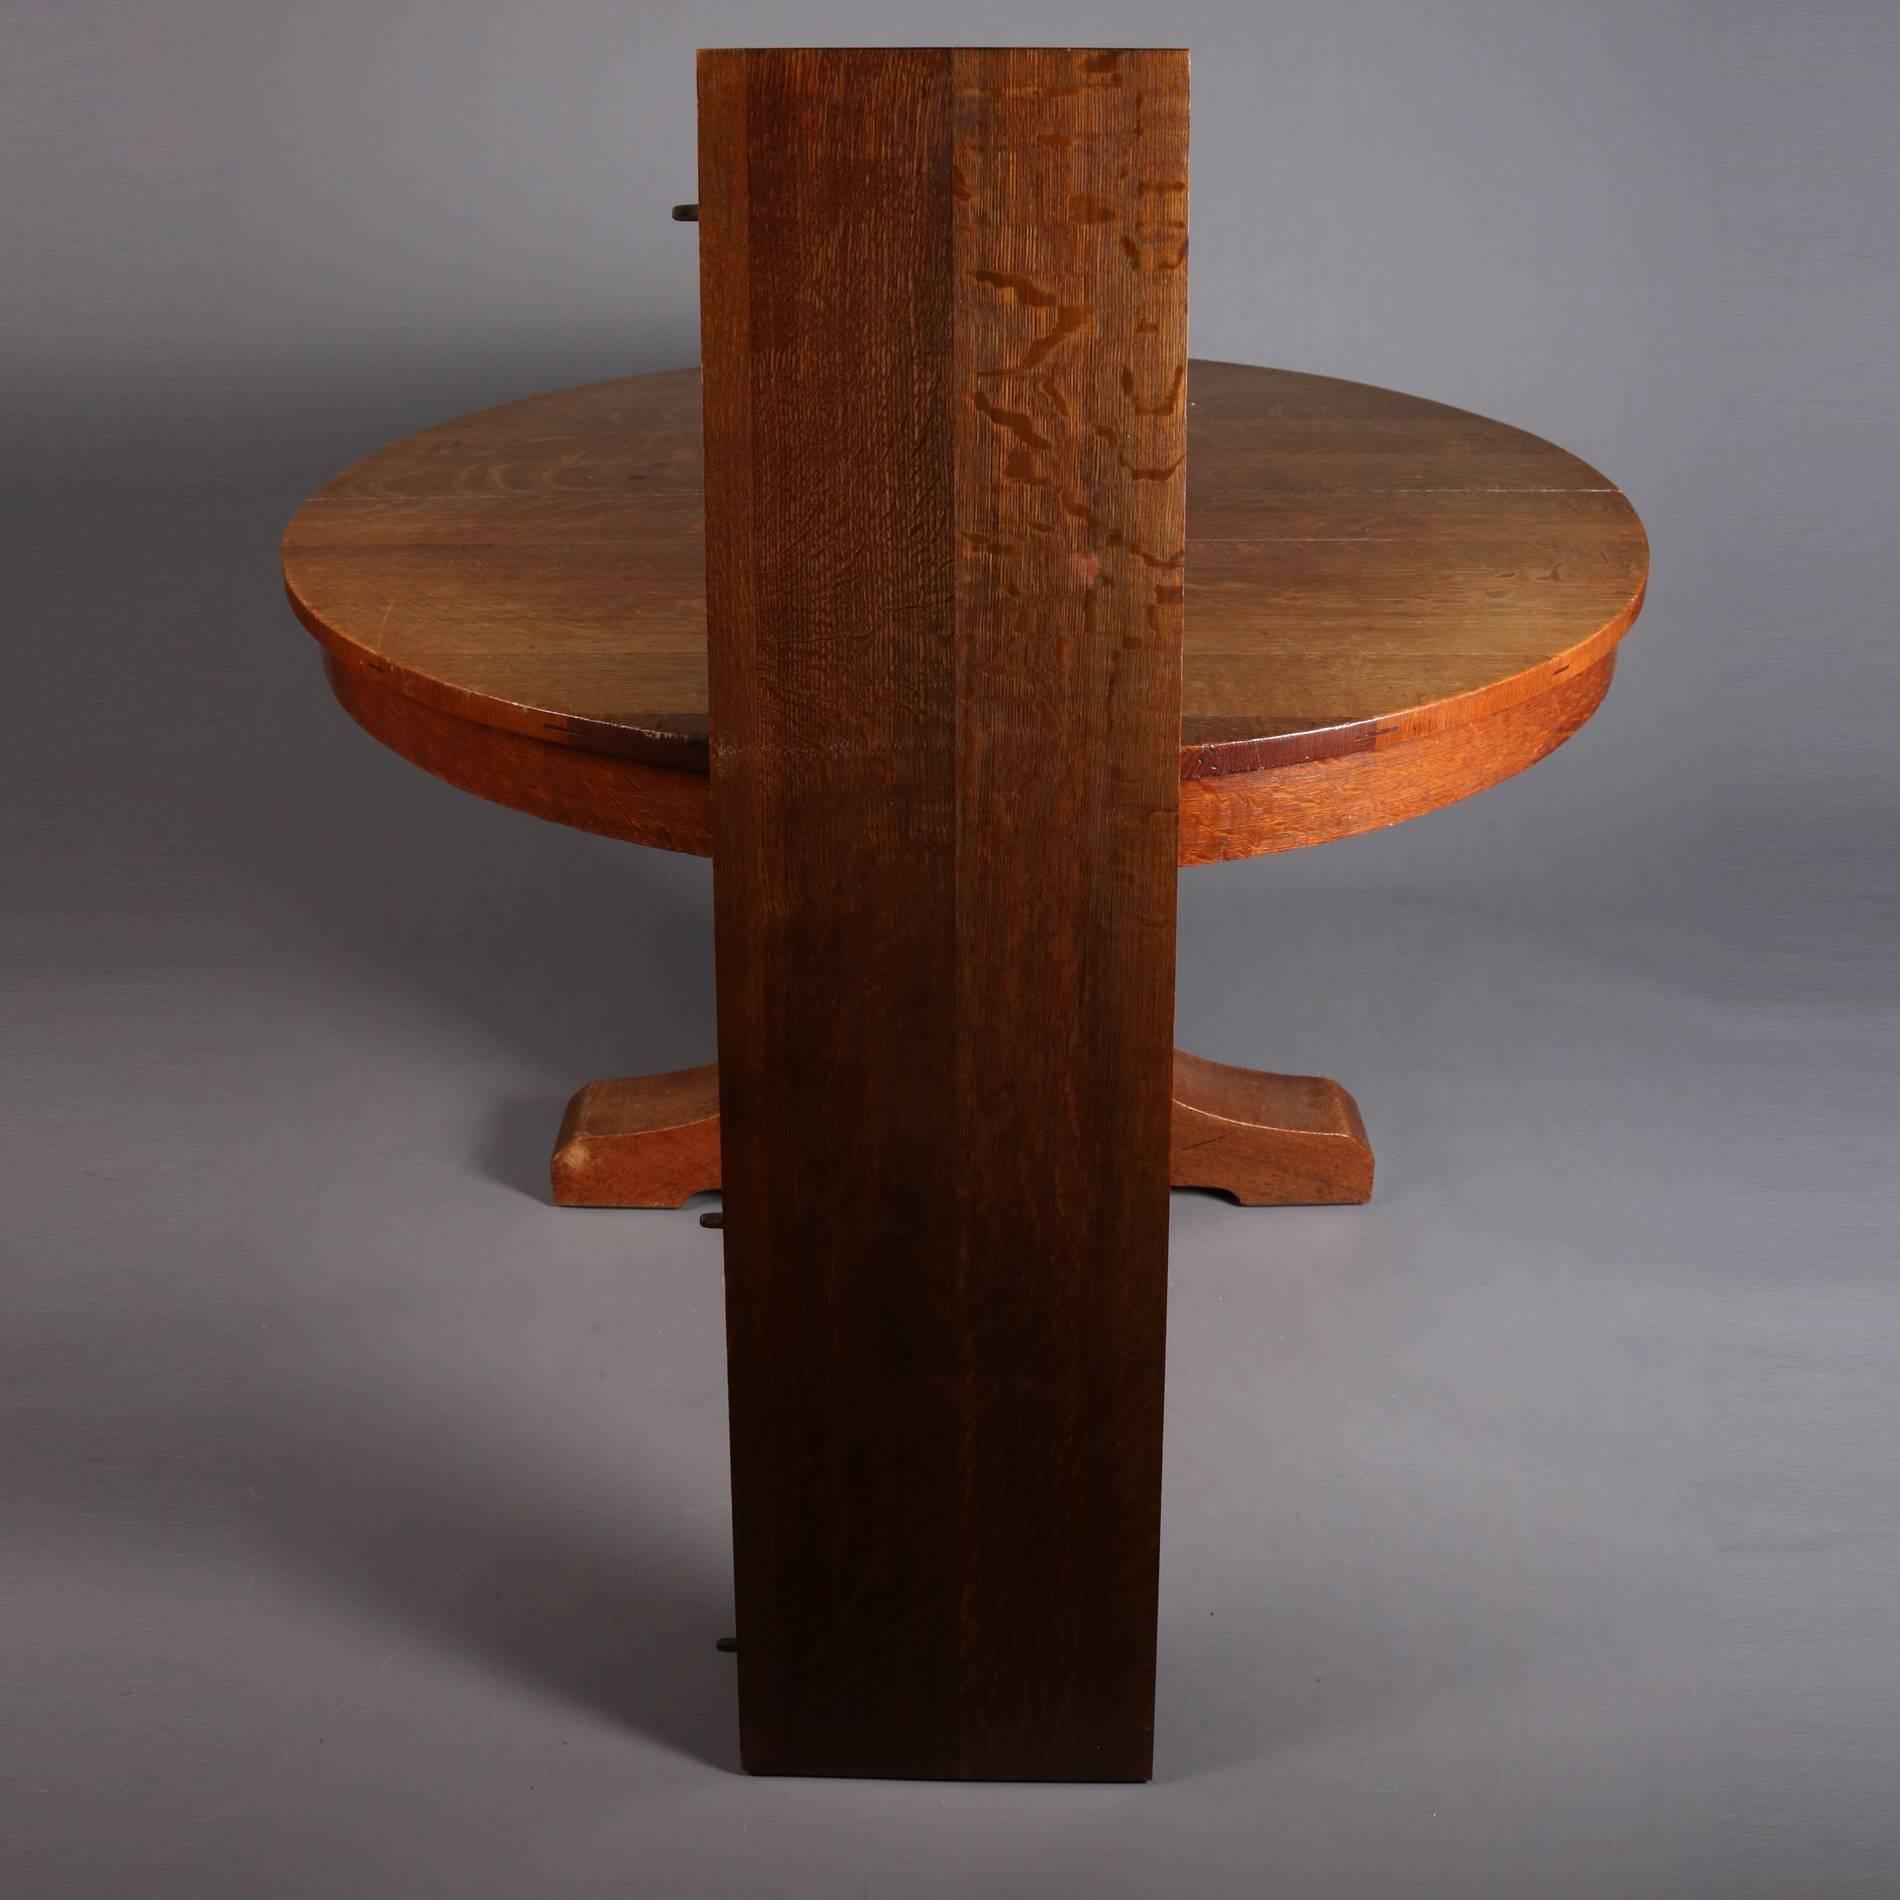 Bon Antique Arts U0026 Crafts Mission Oak Dining Table By L. U0026 J. G. Stickley  Features Four